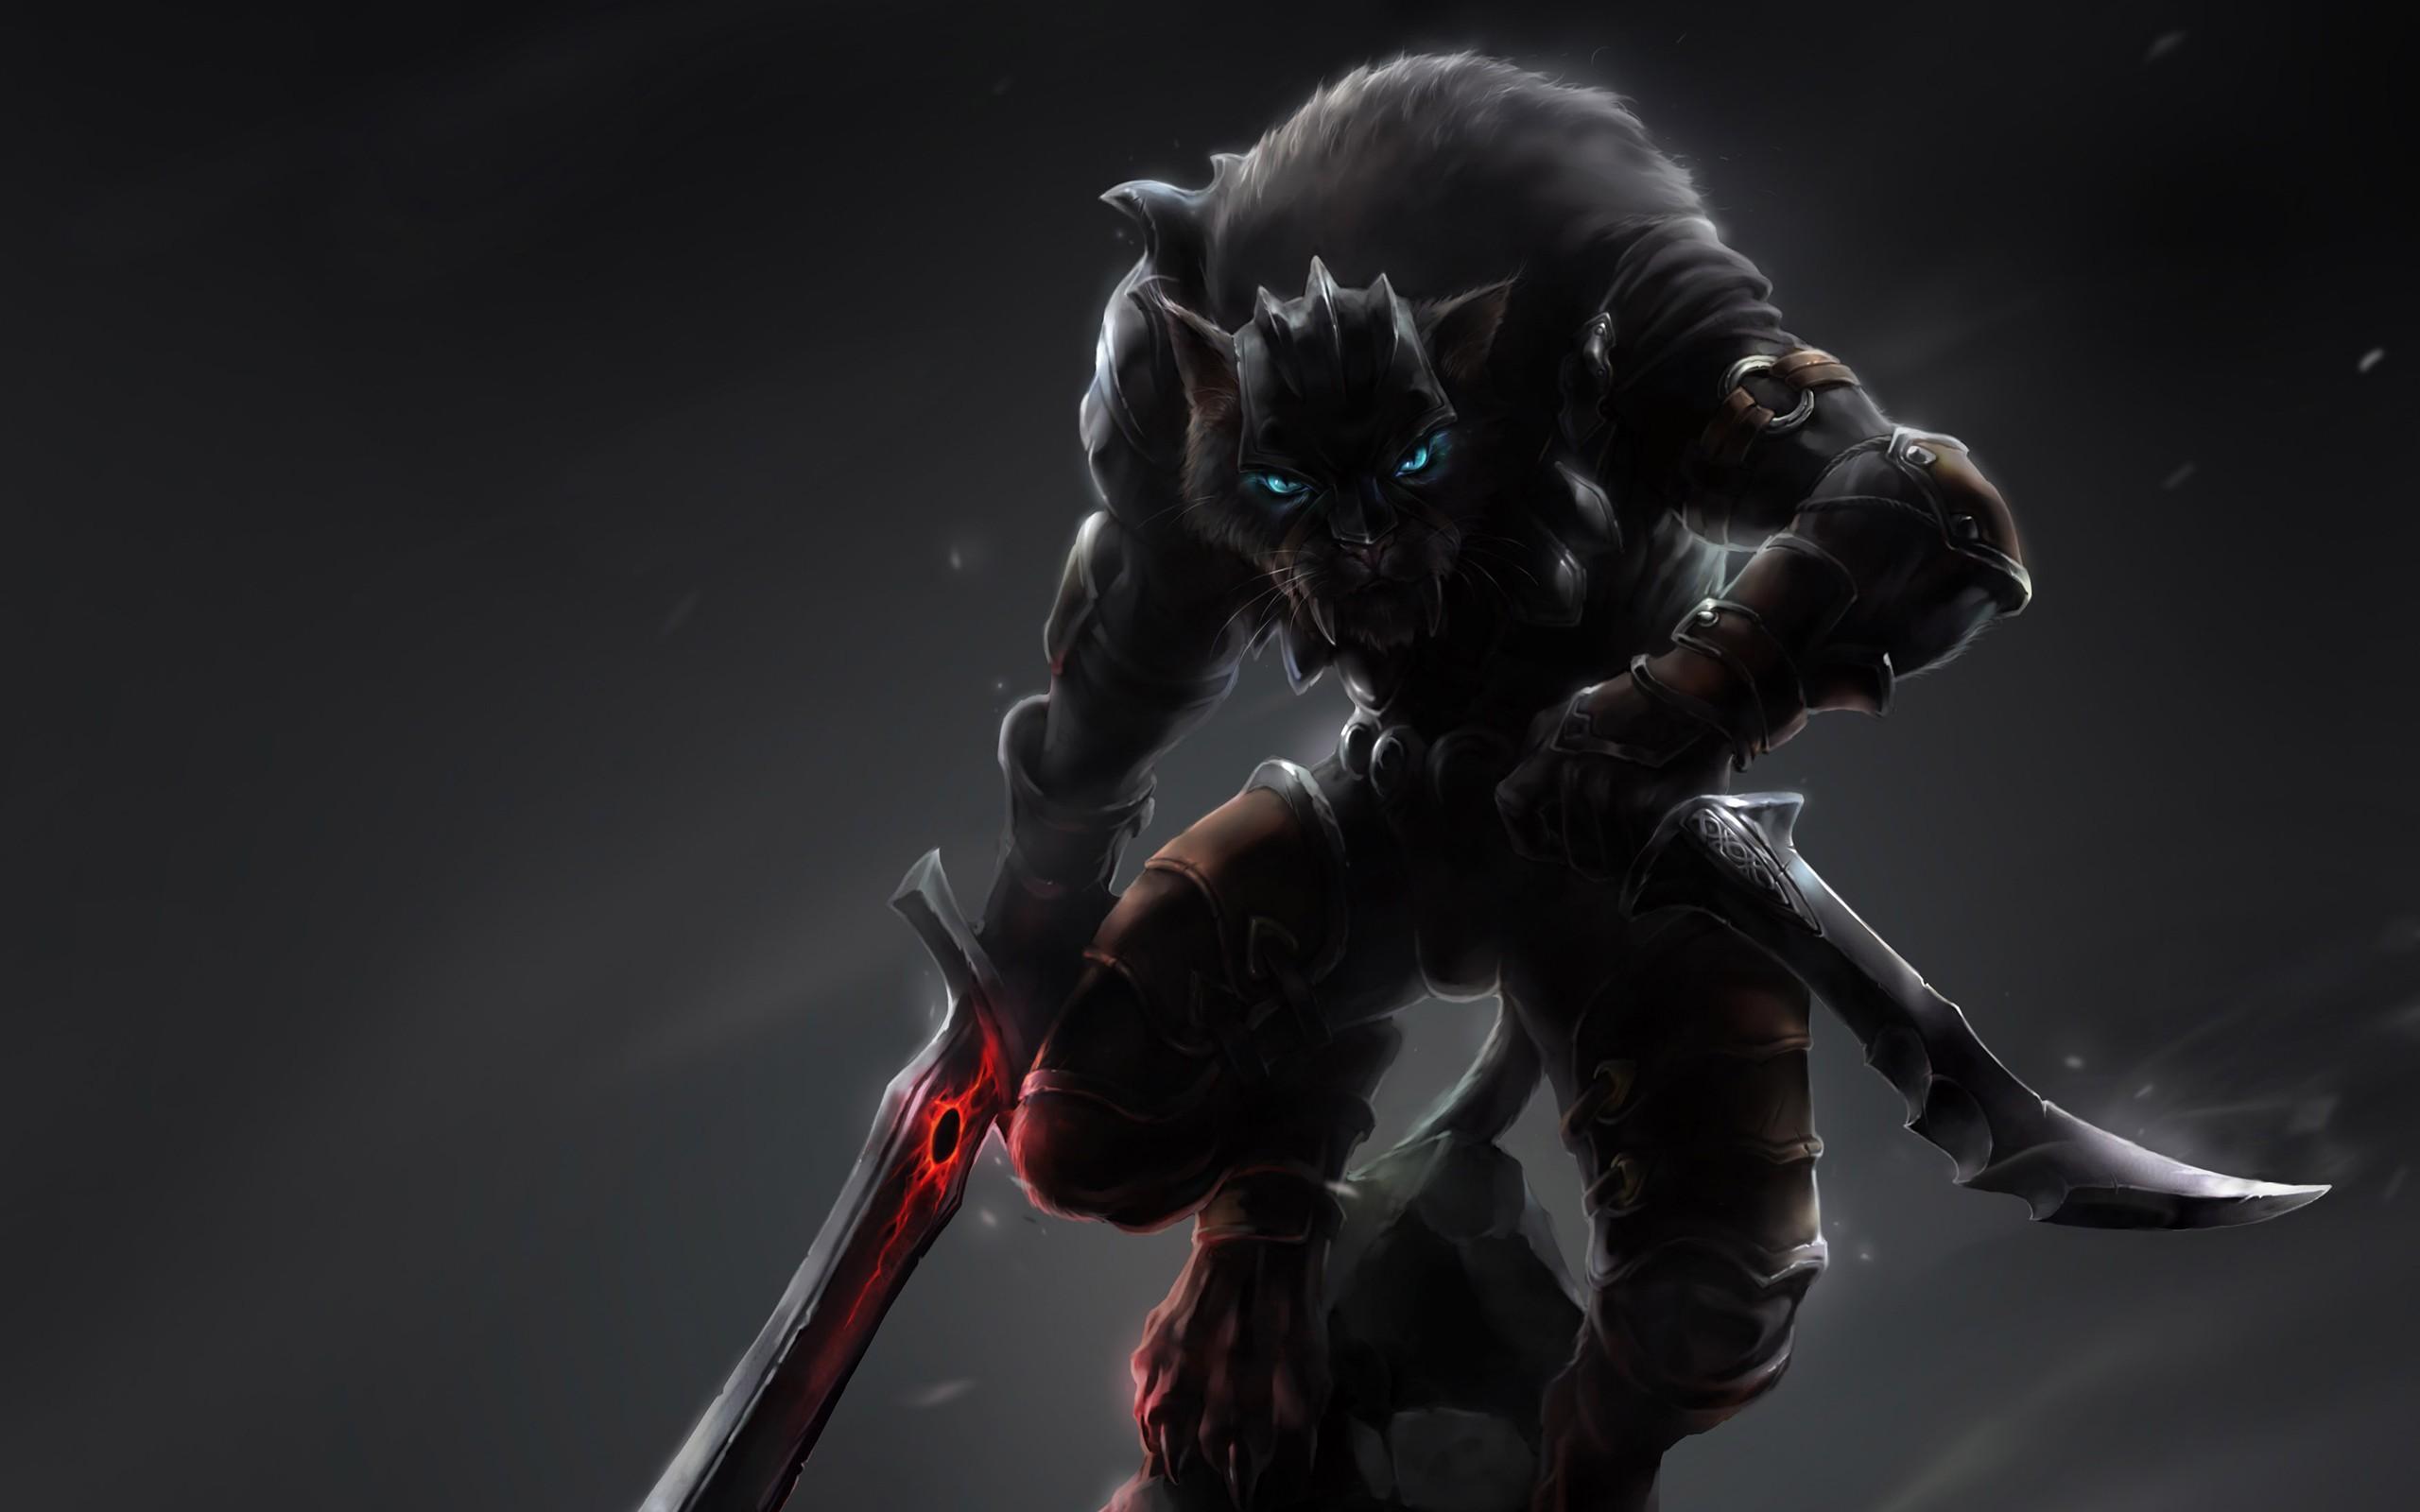 Fantasy feline warrior